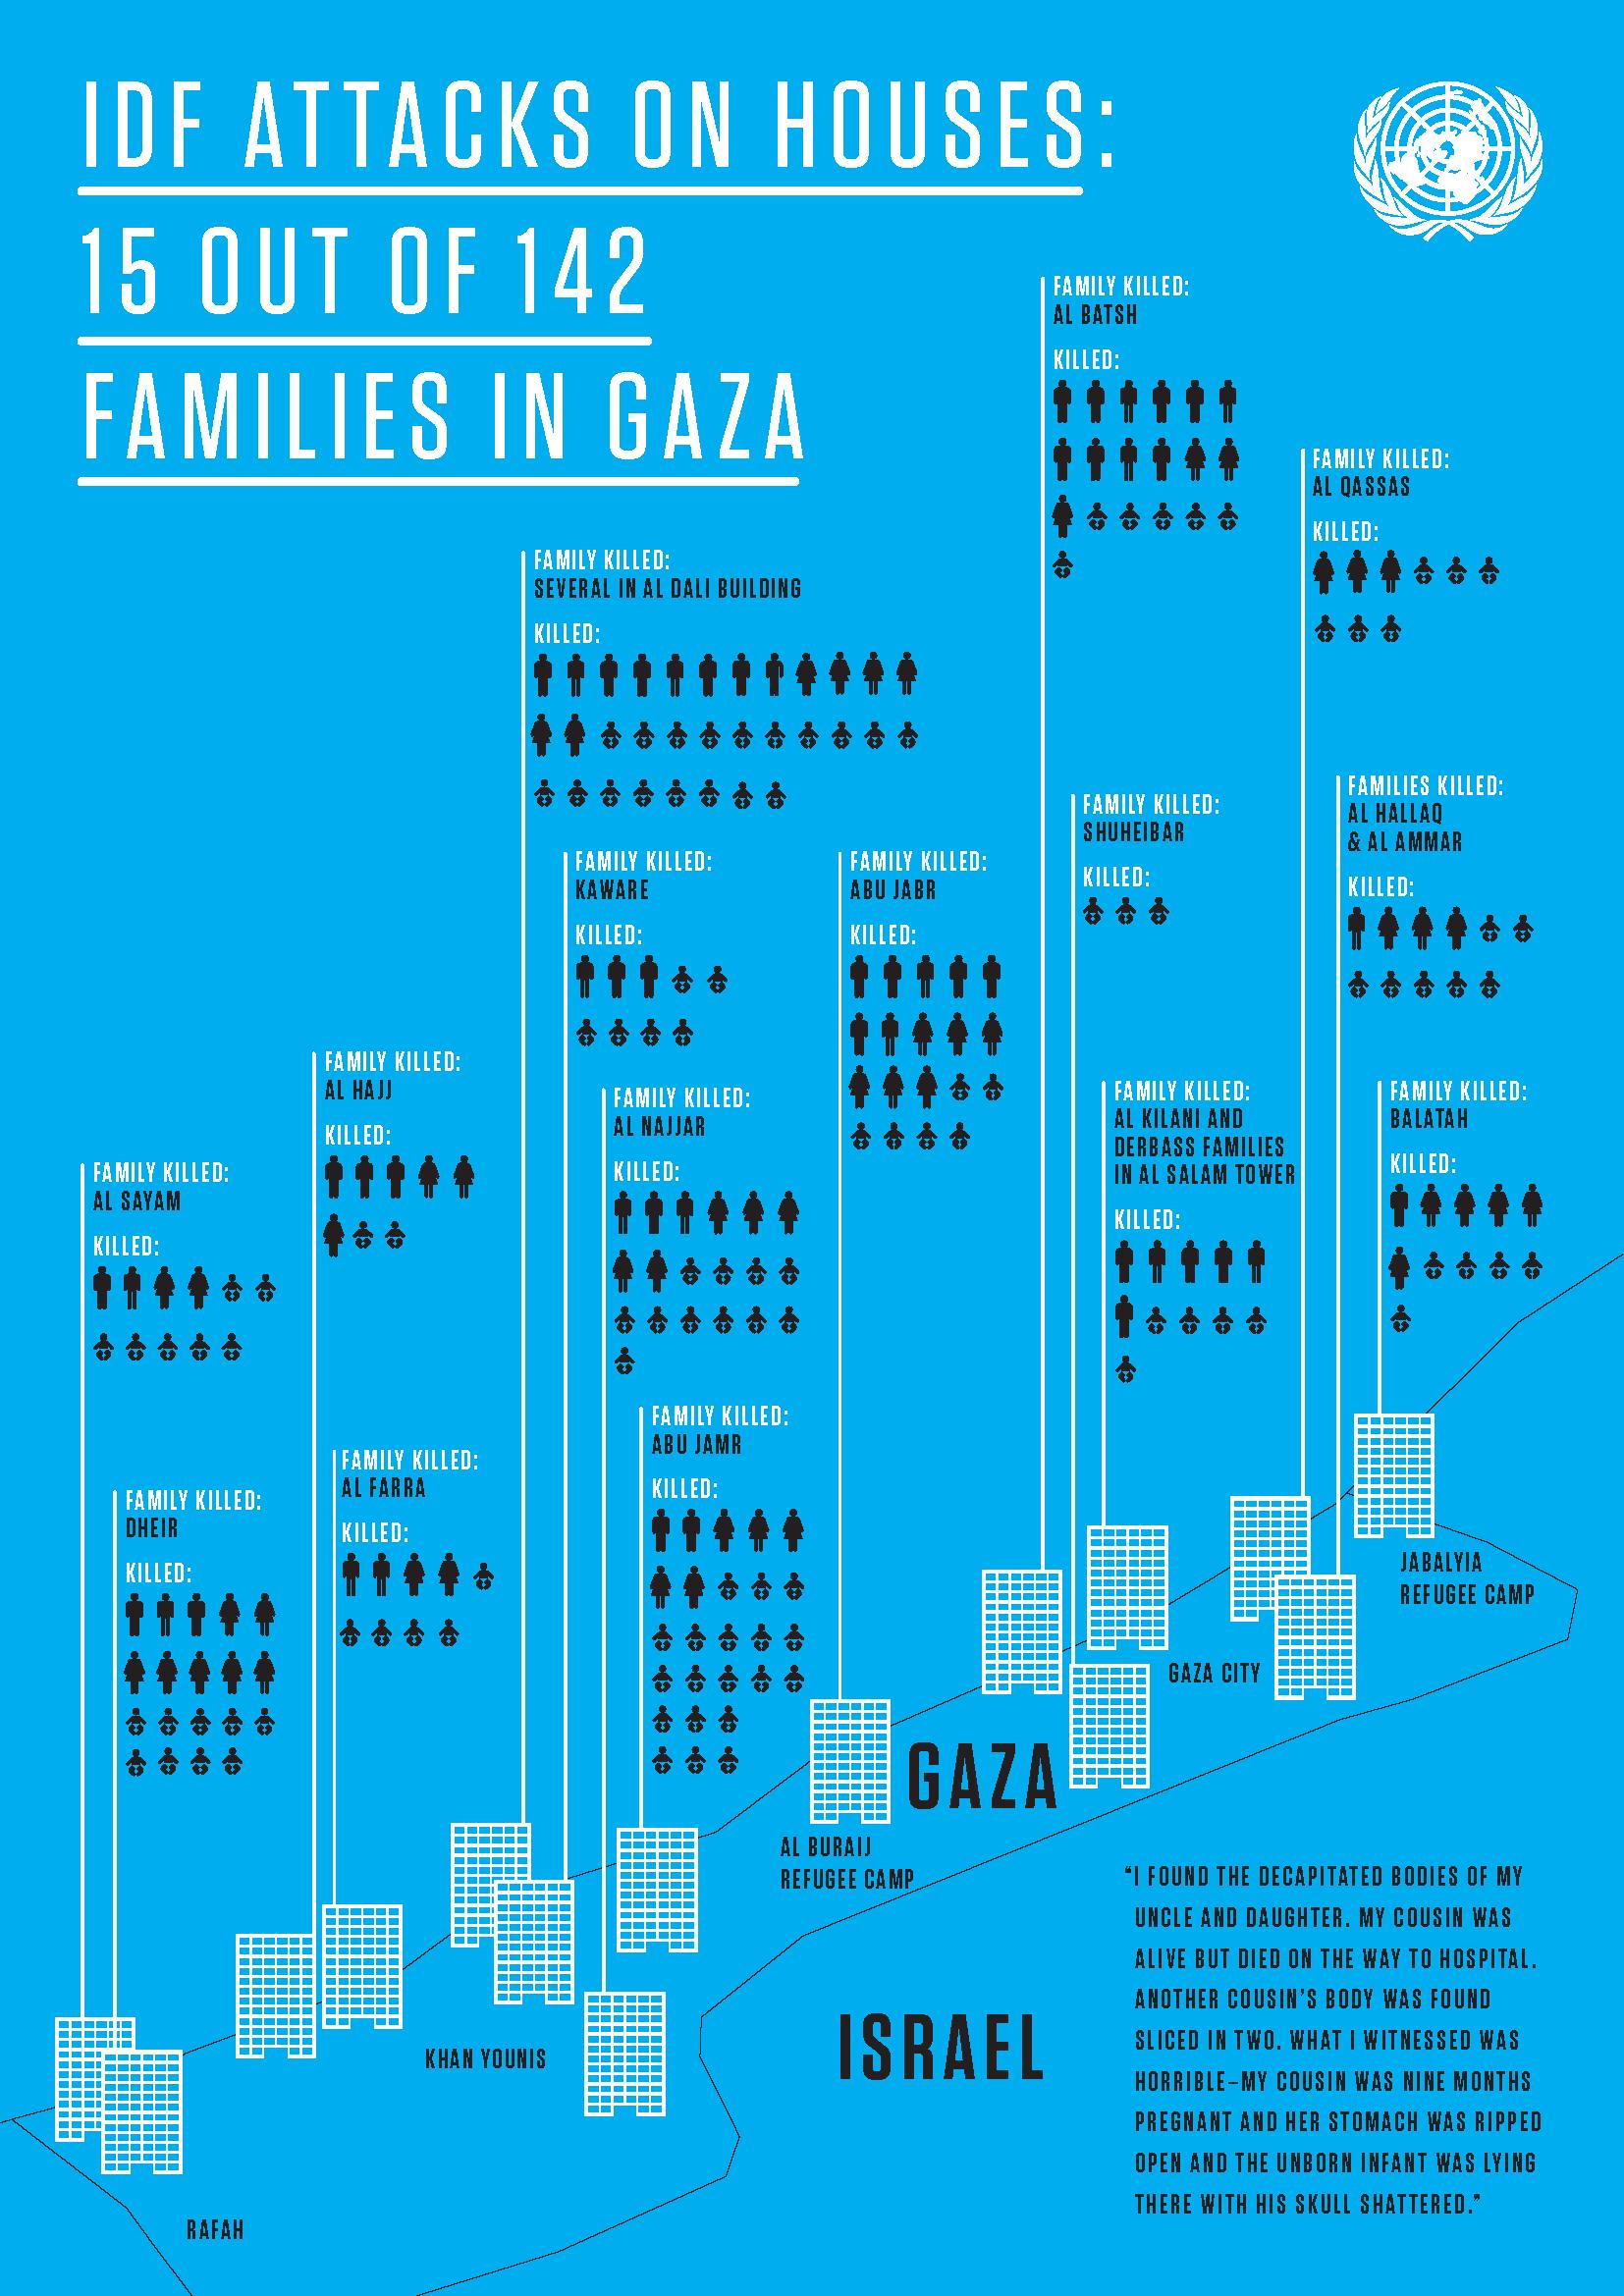 IDF attacks on houses